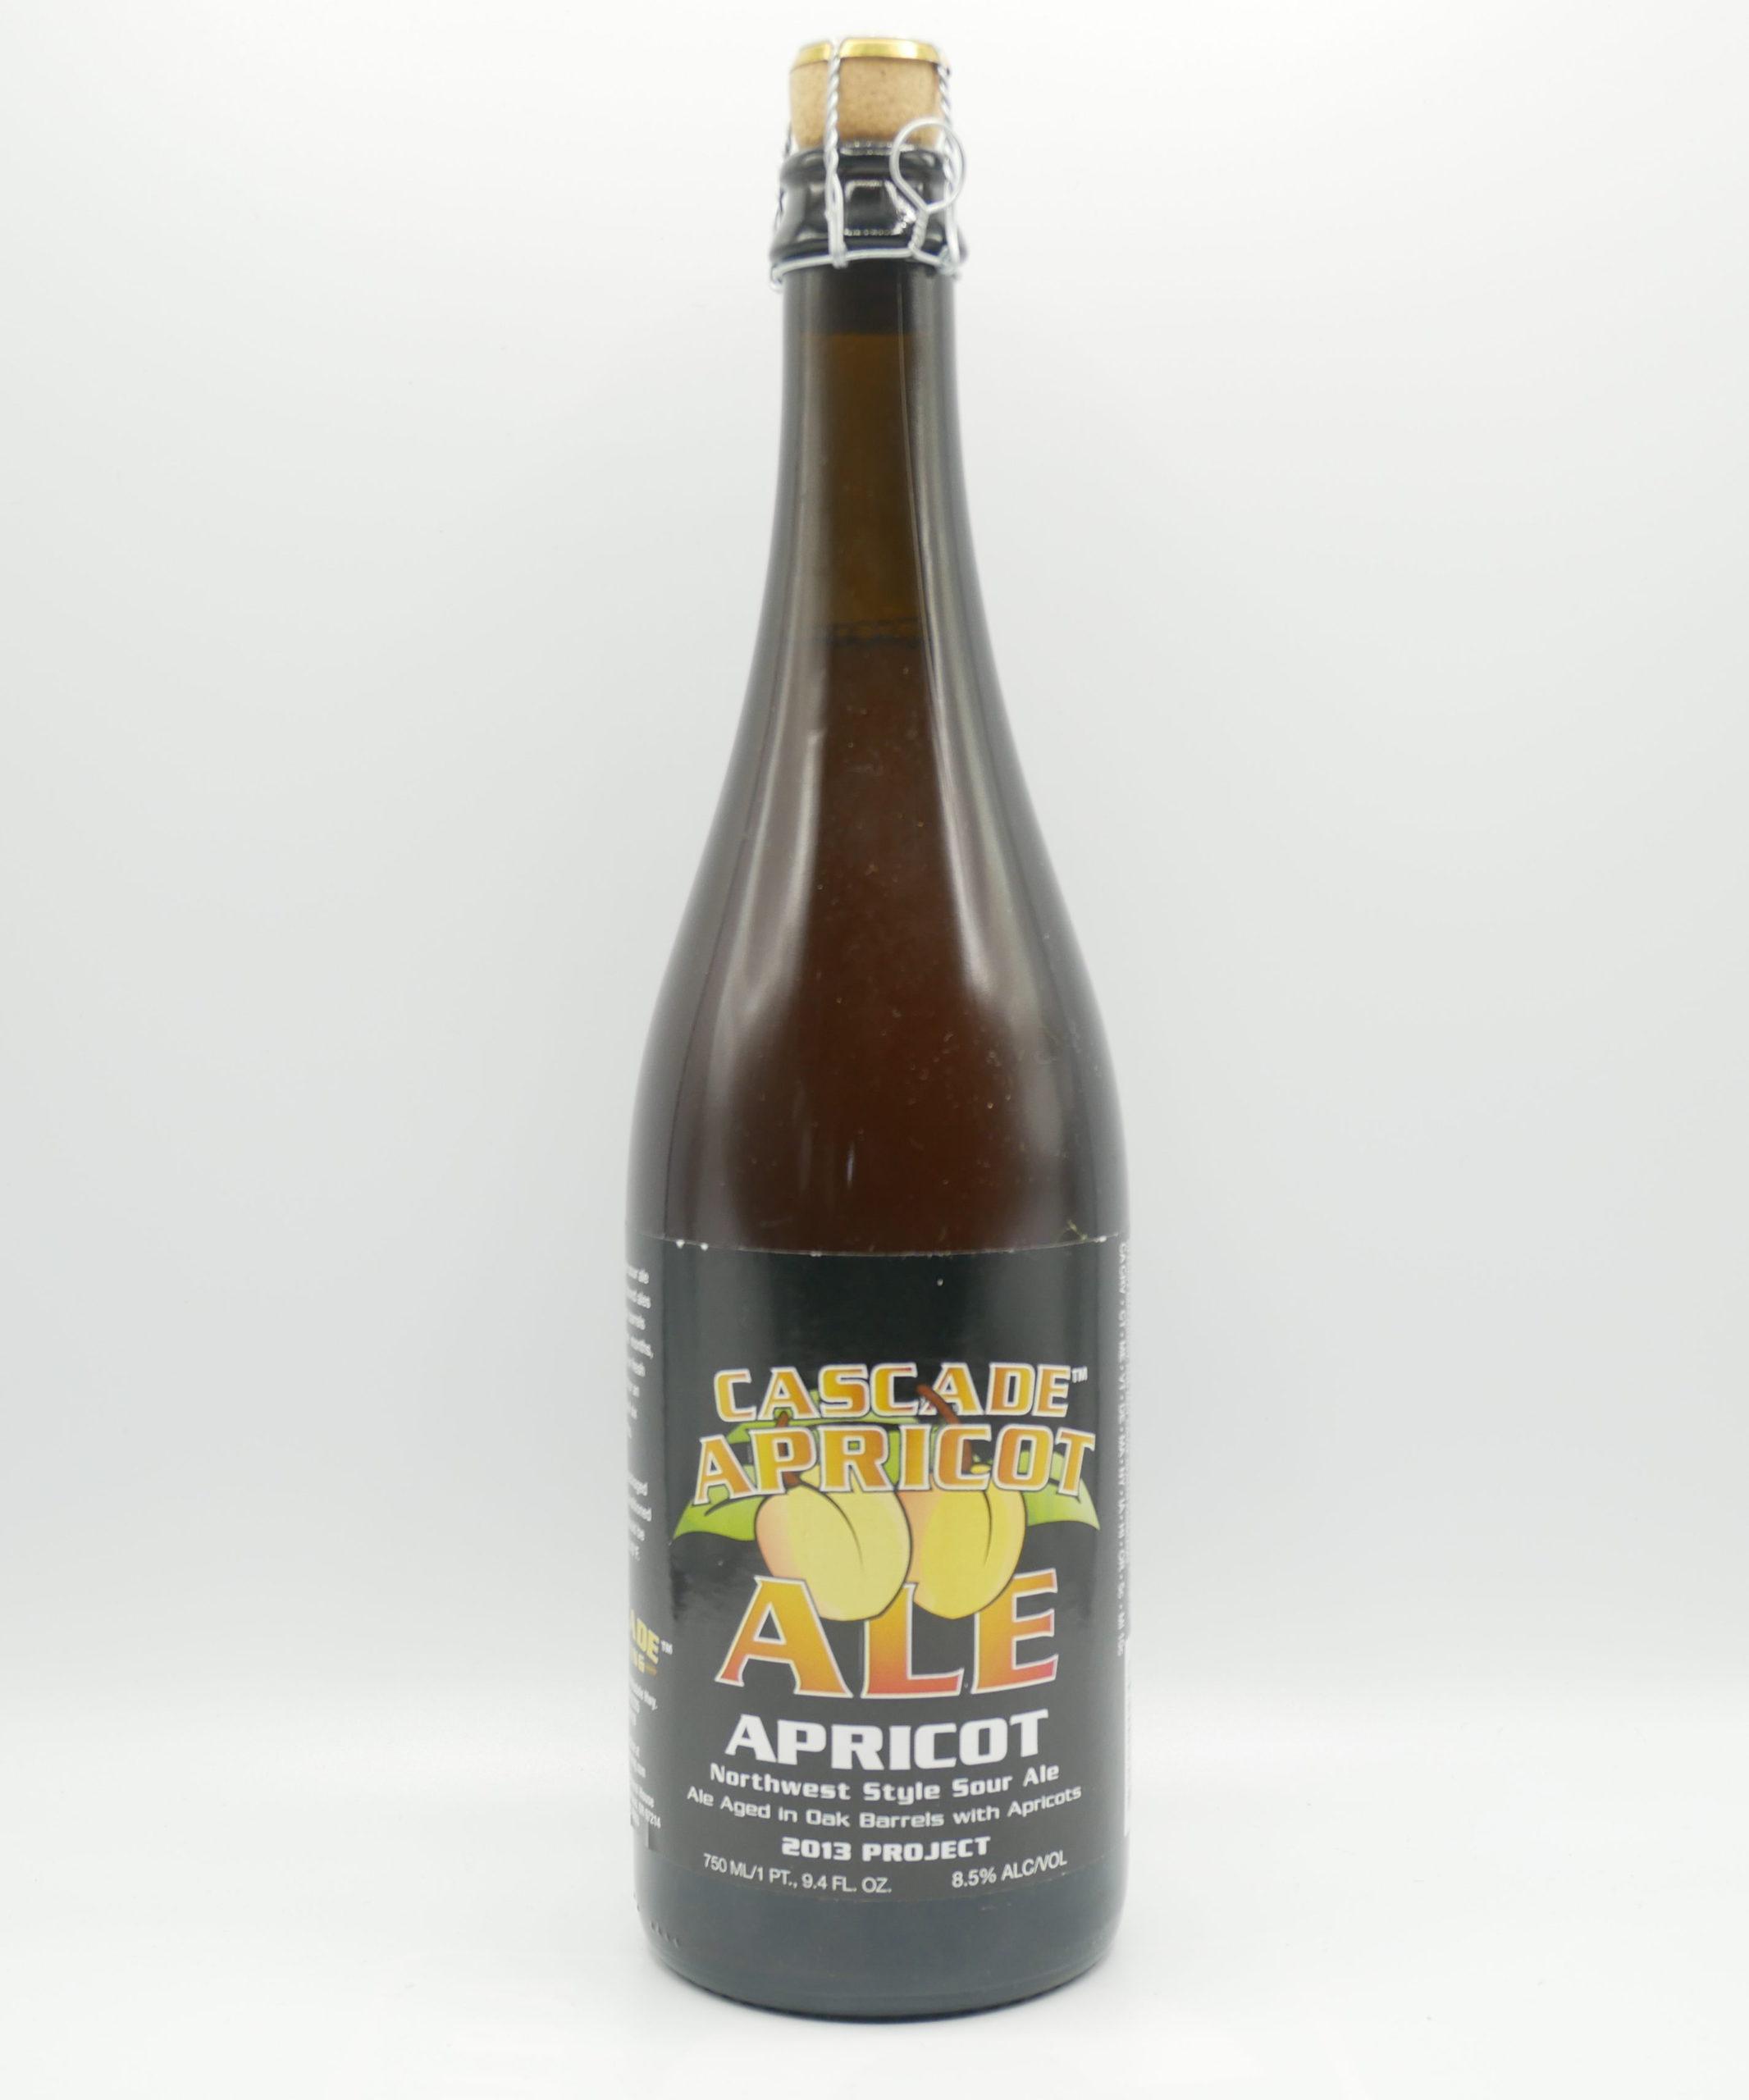 Image Cascade Apricot 2013 vintage